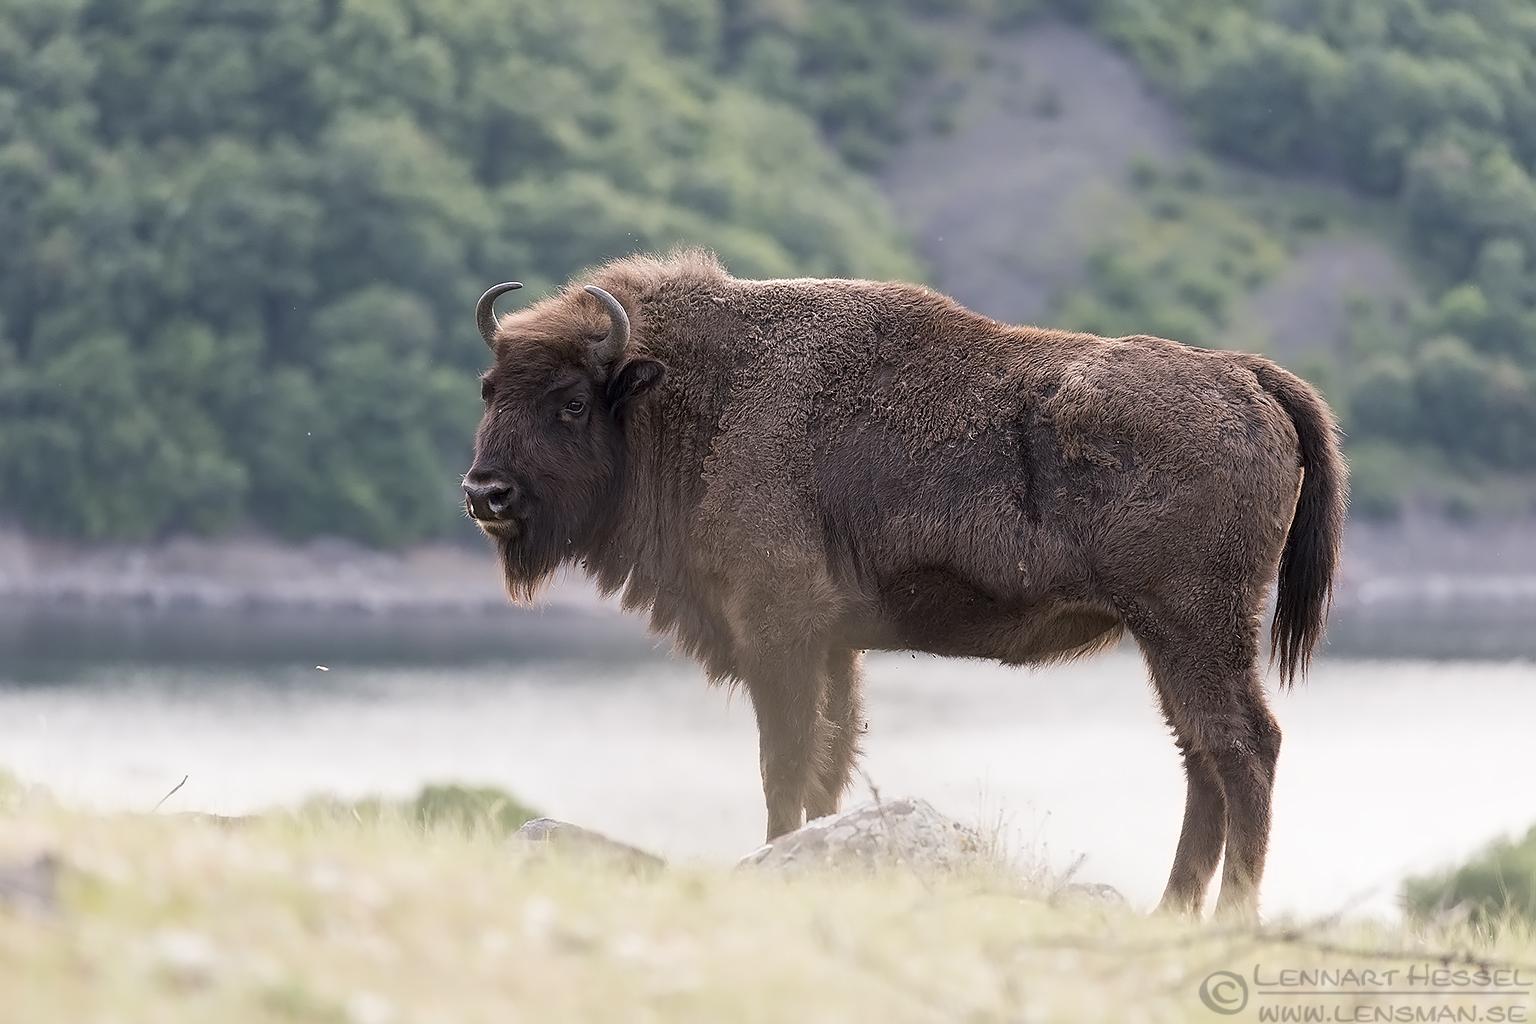 European Bison Bulgaria 2016